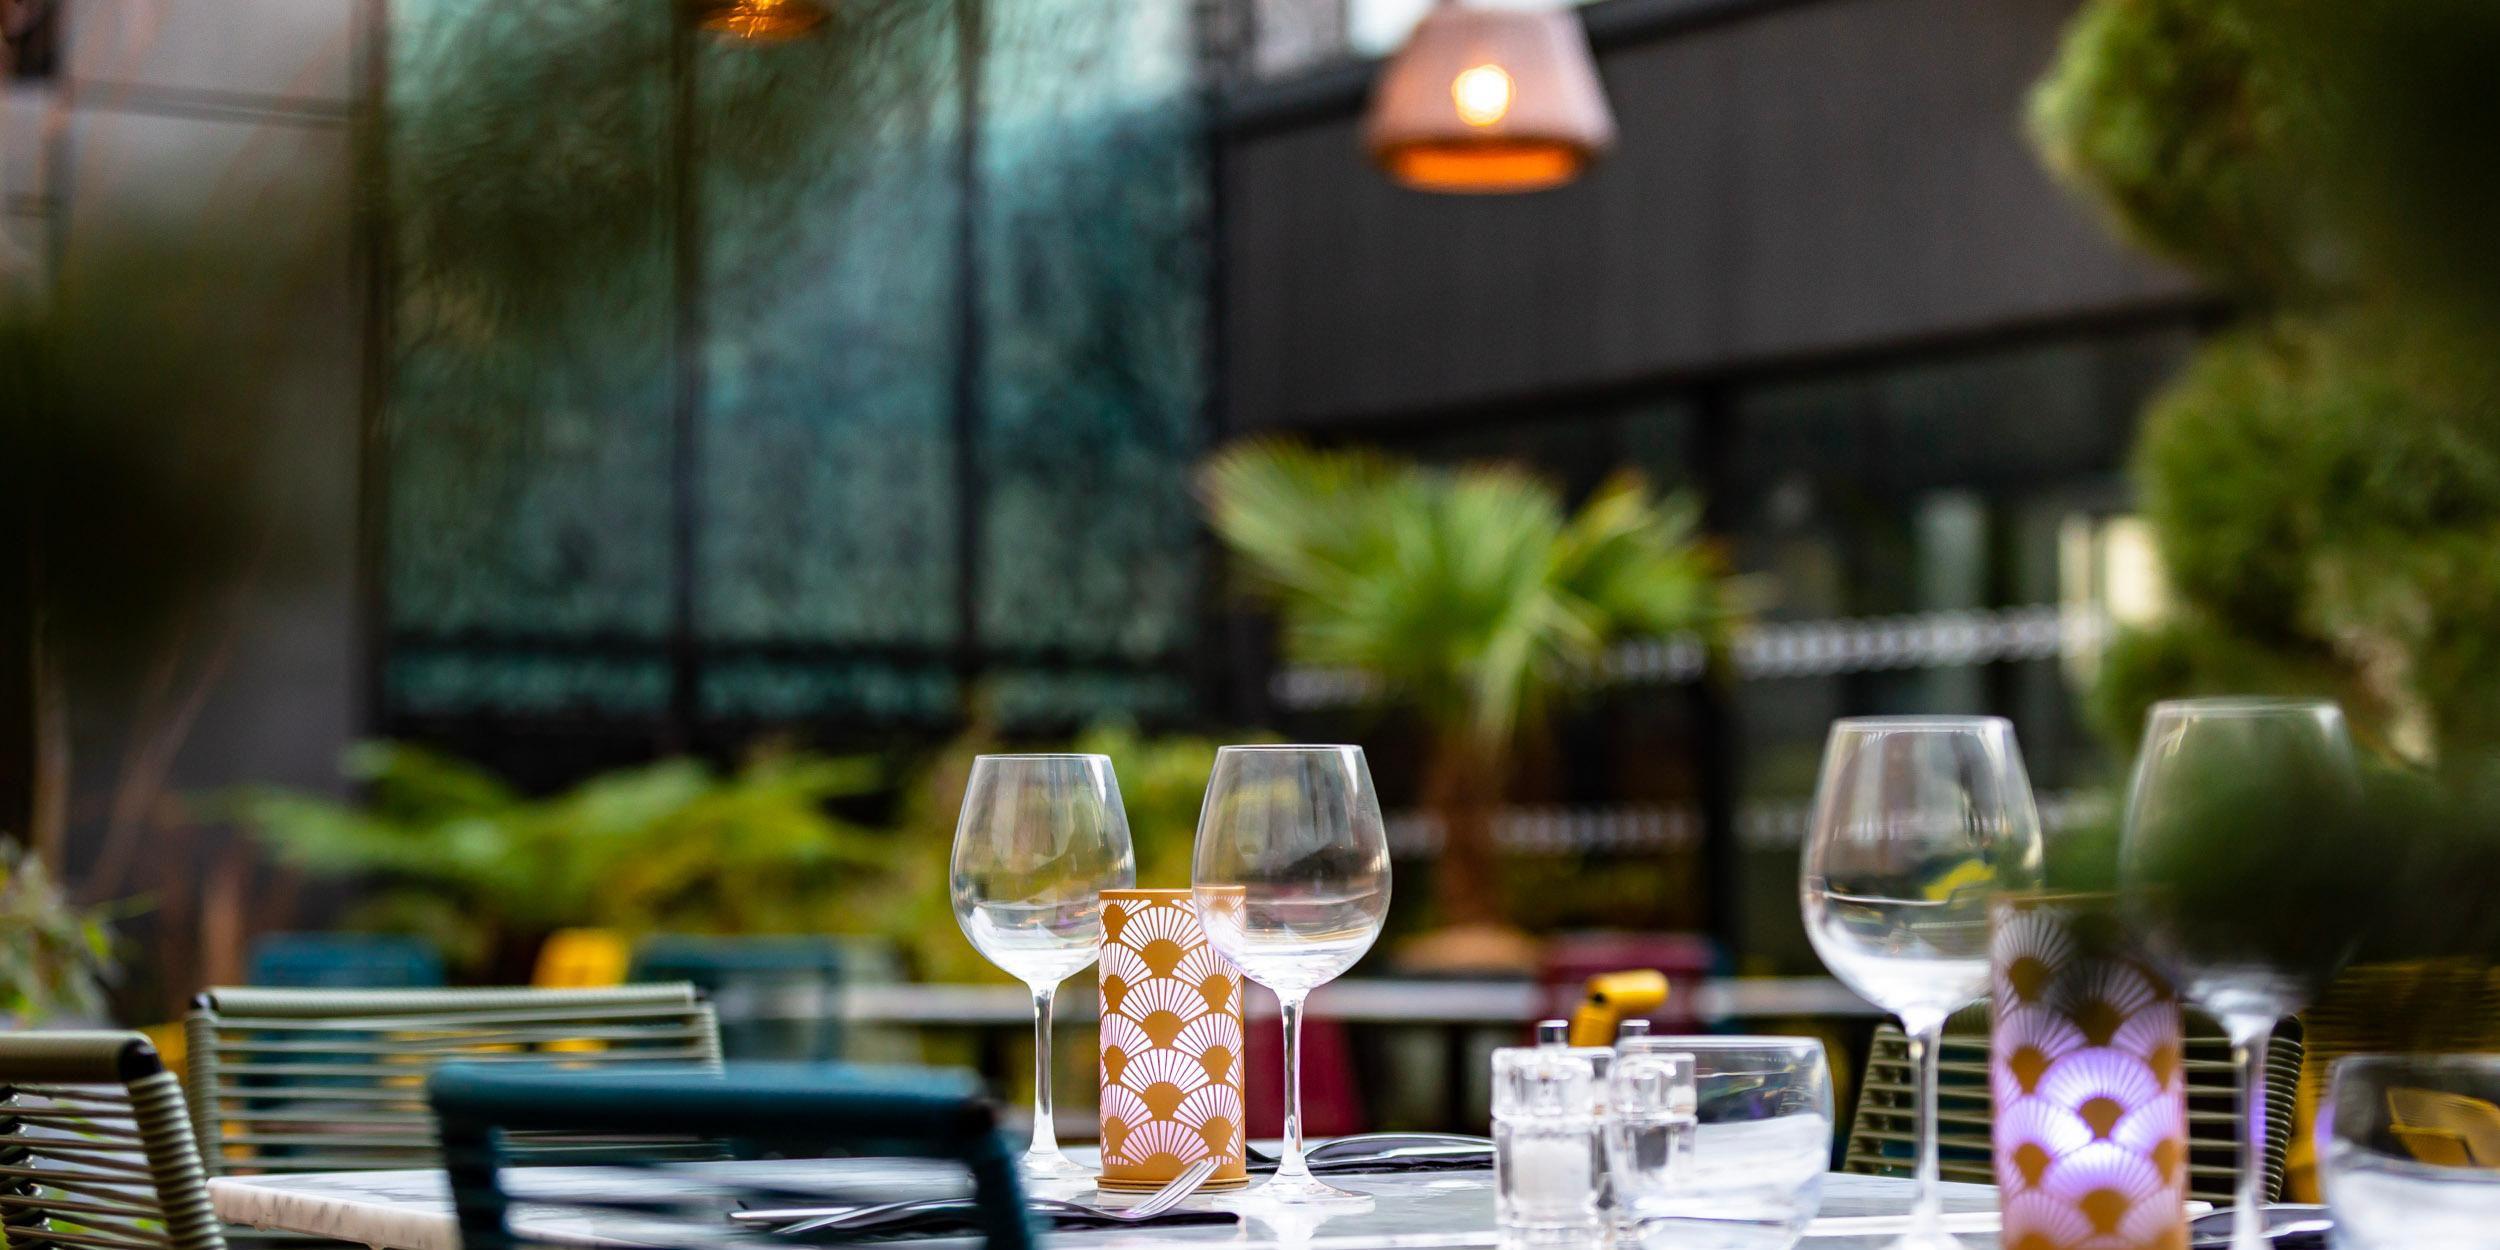 Restaurant The Garden - Terrace